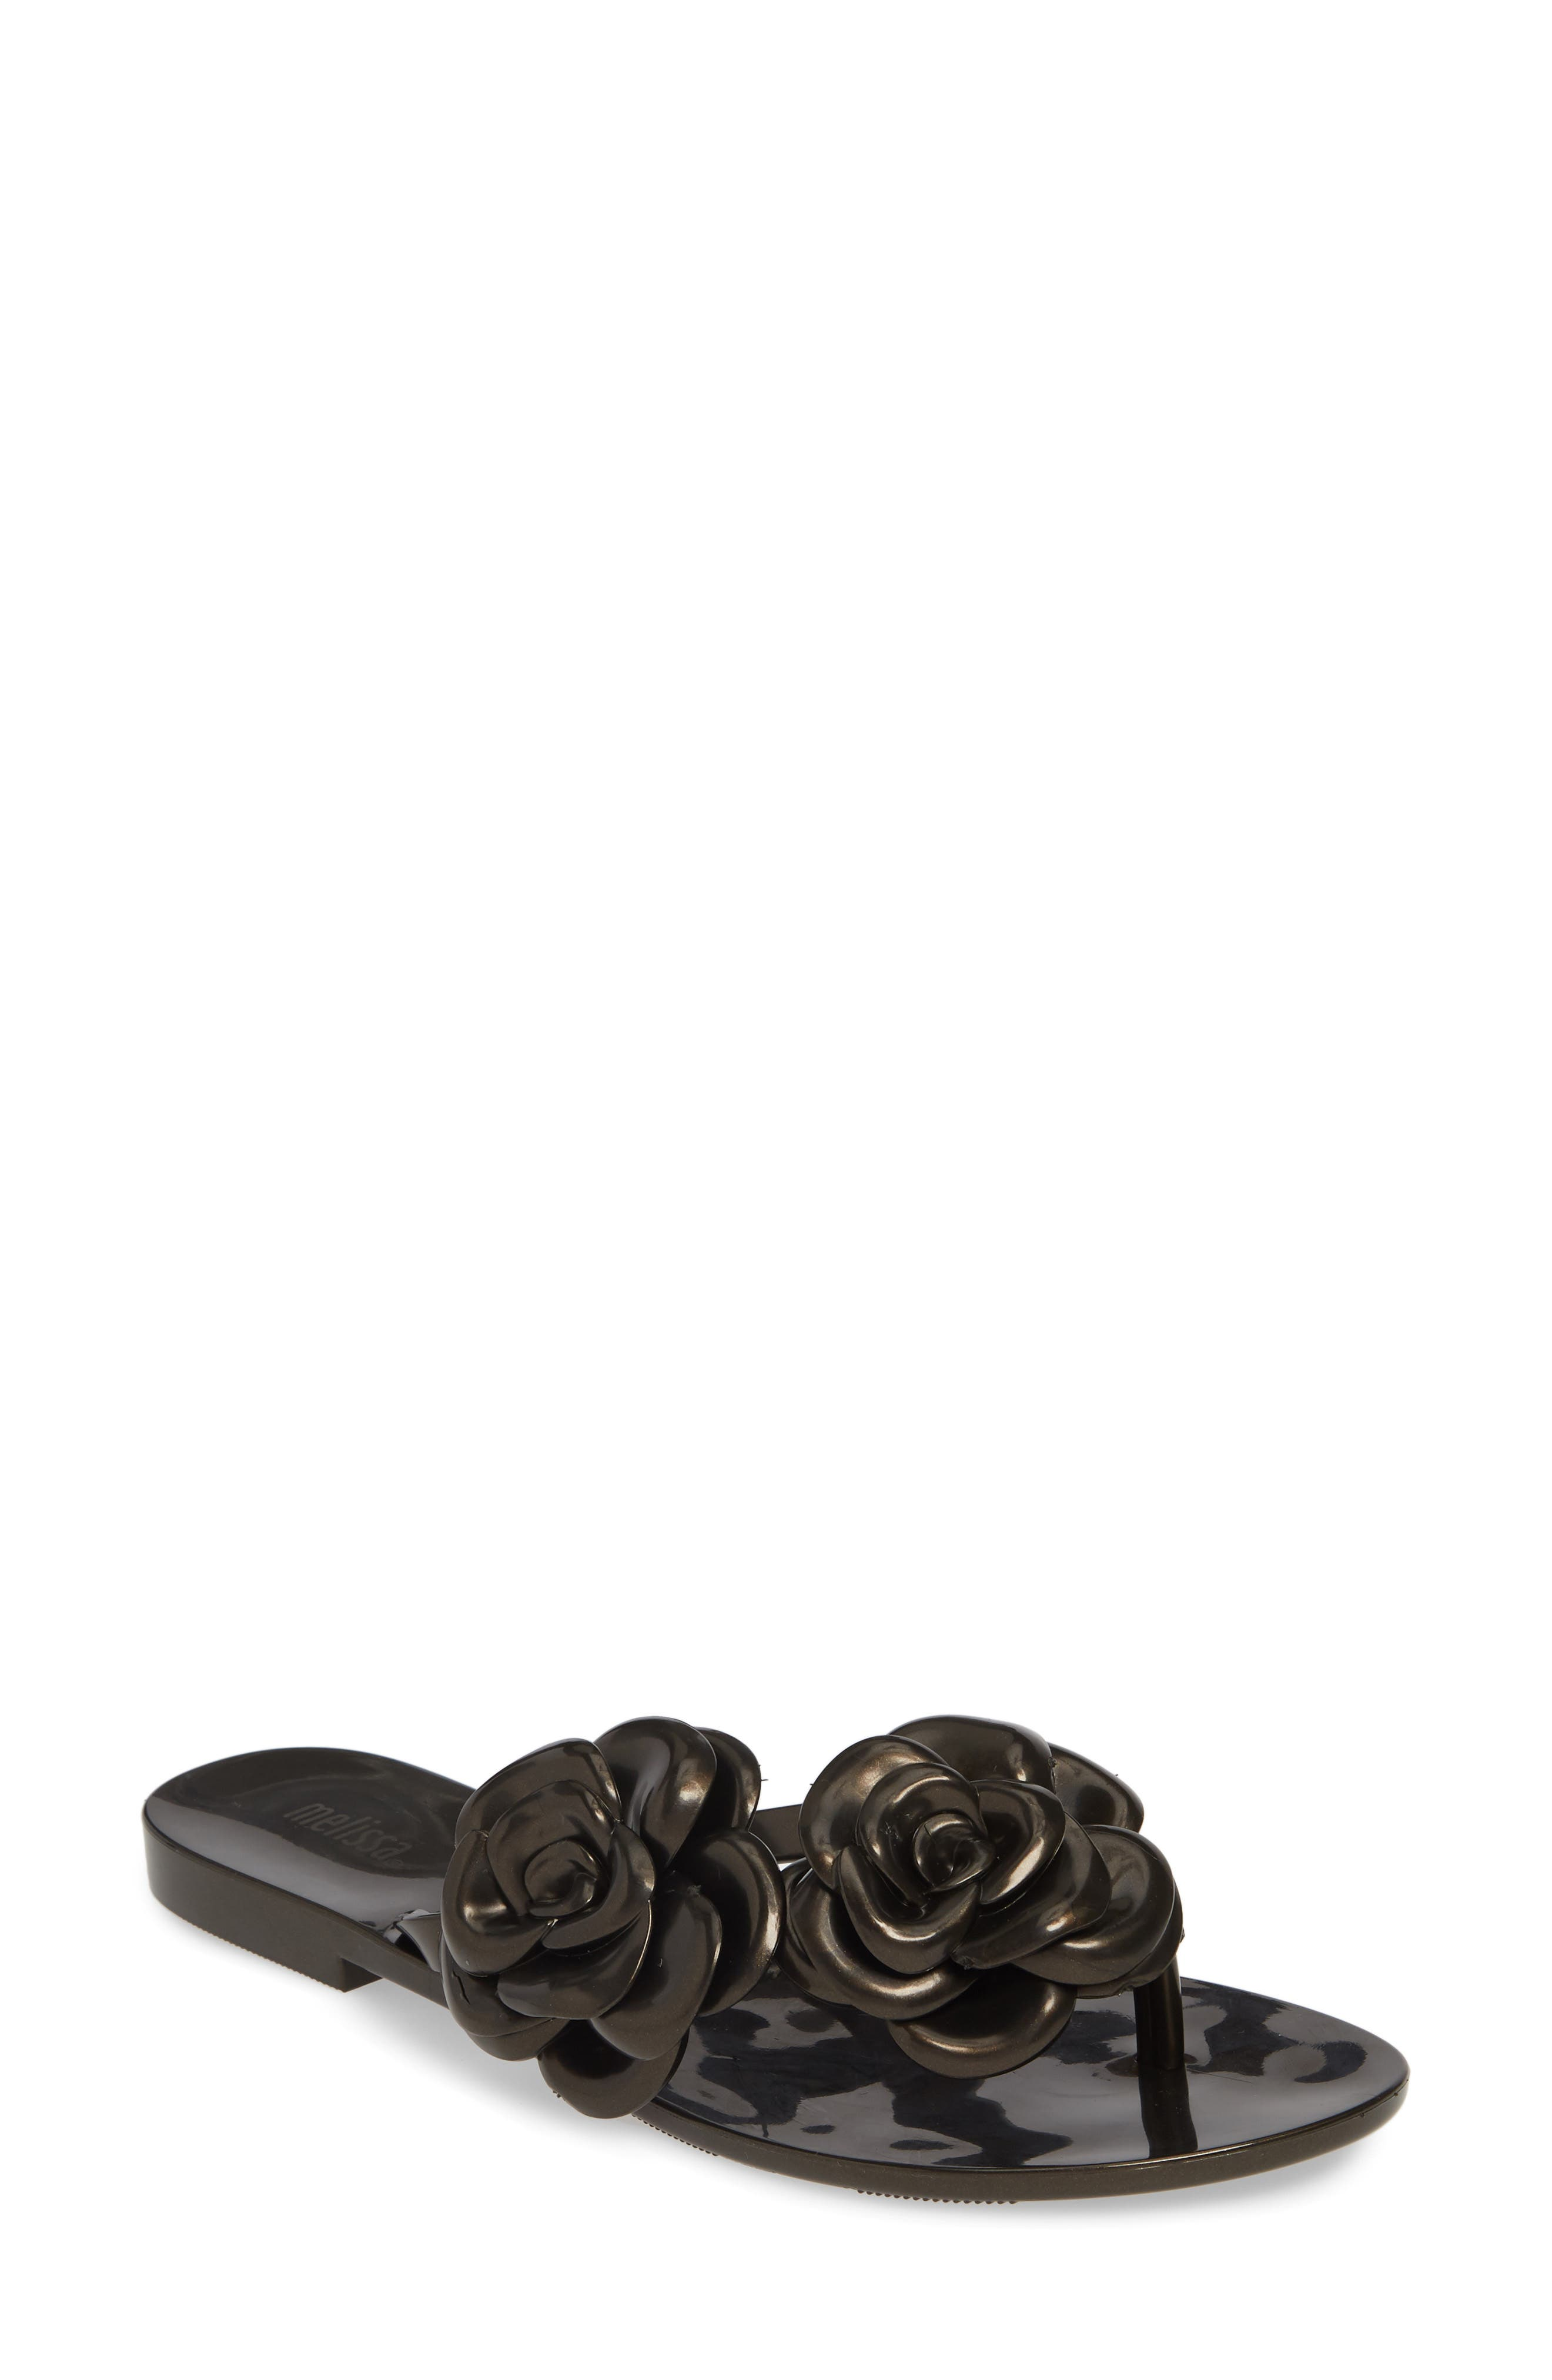 Melissa Harmonic Flower Flip Flop, Black